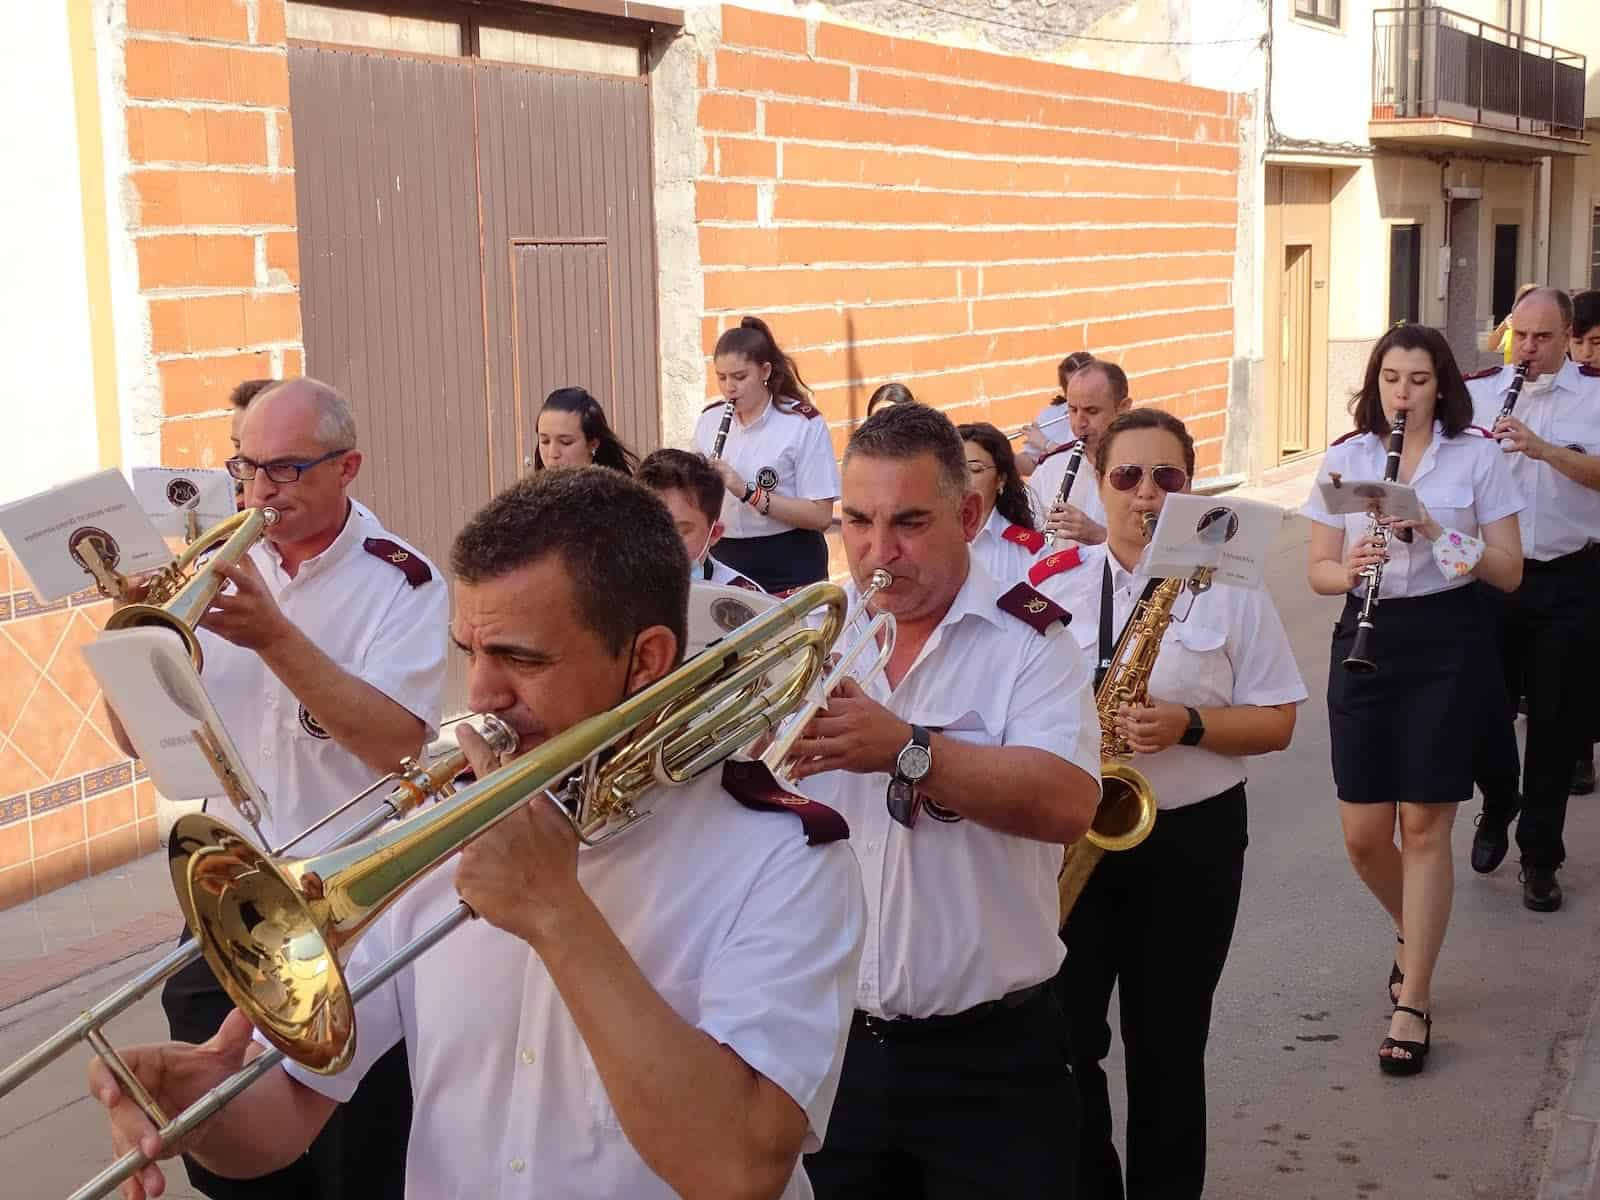 La UMQ lleva la música festiva por las calles de Quintanar de la Orden 15